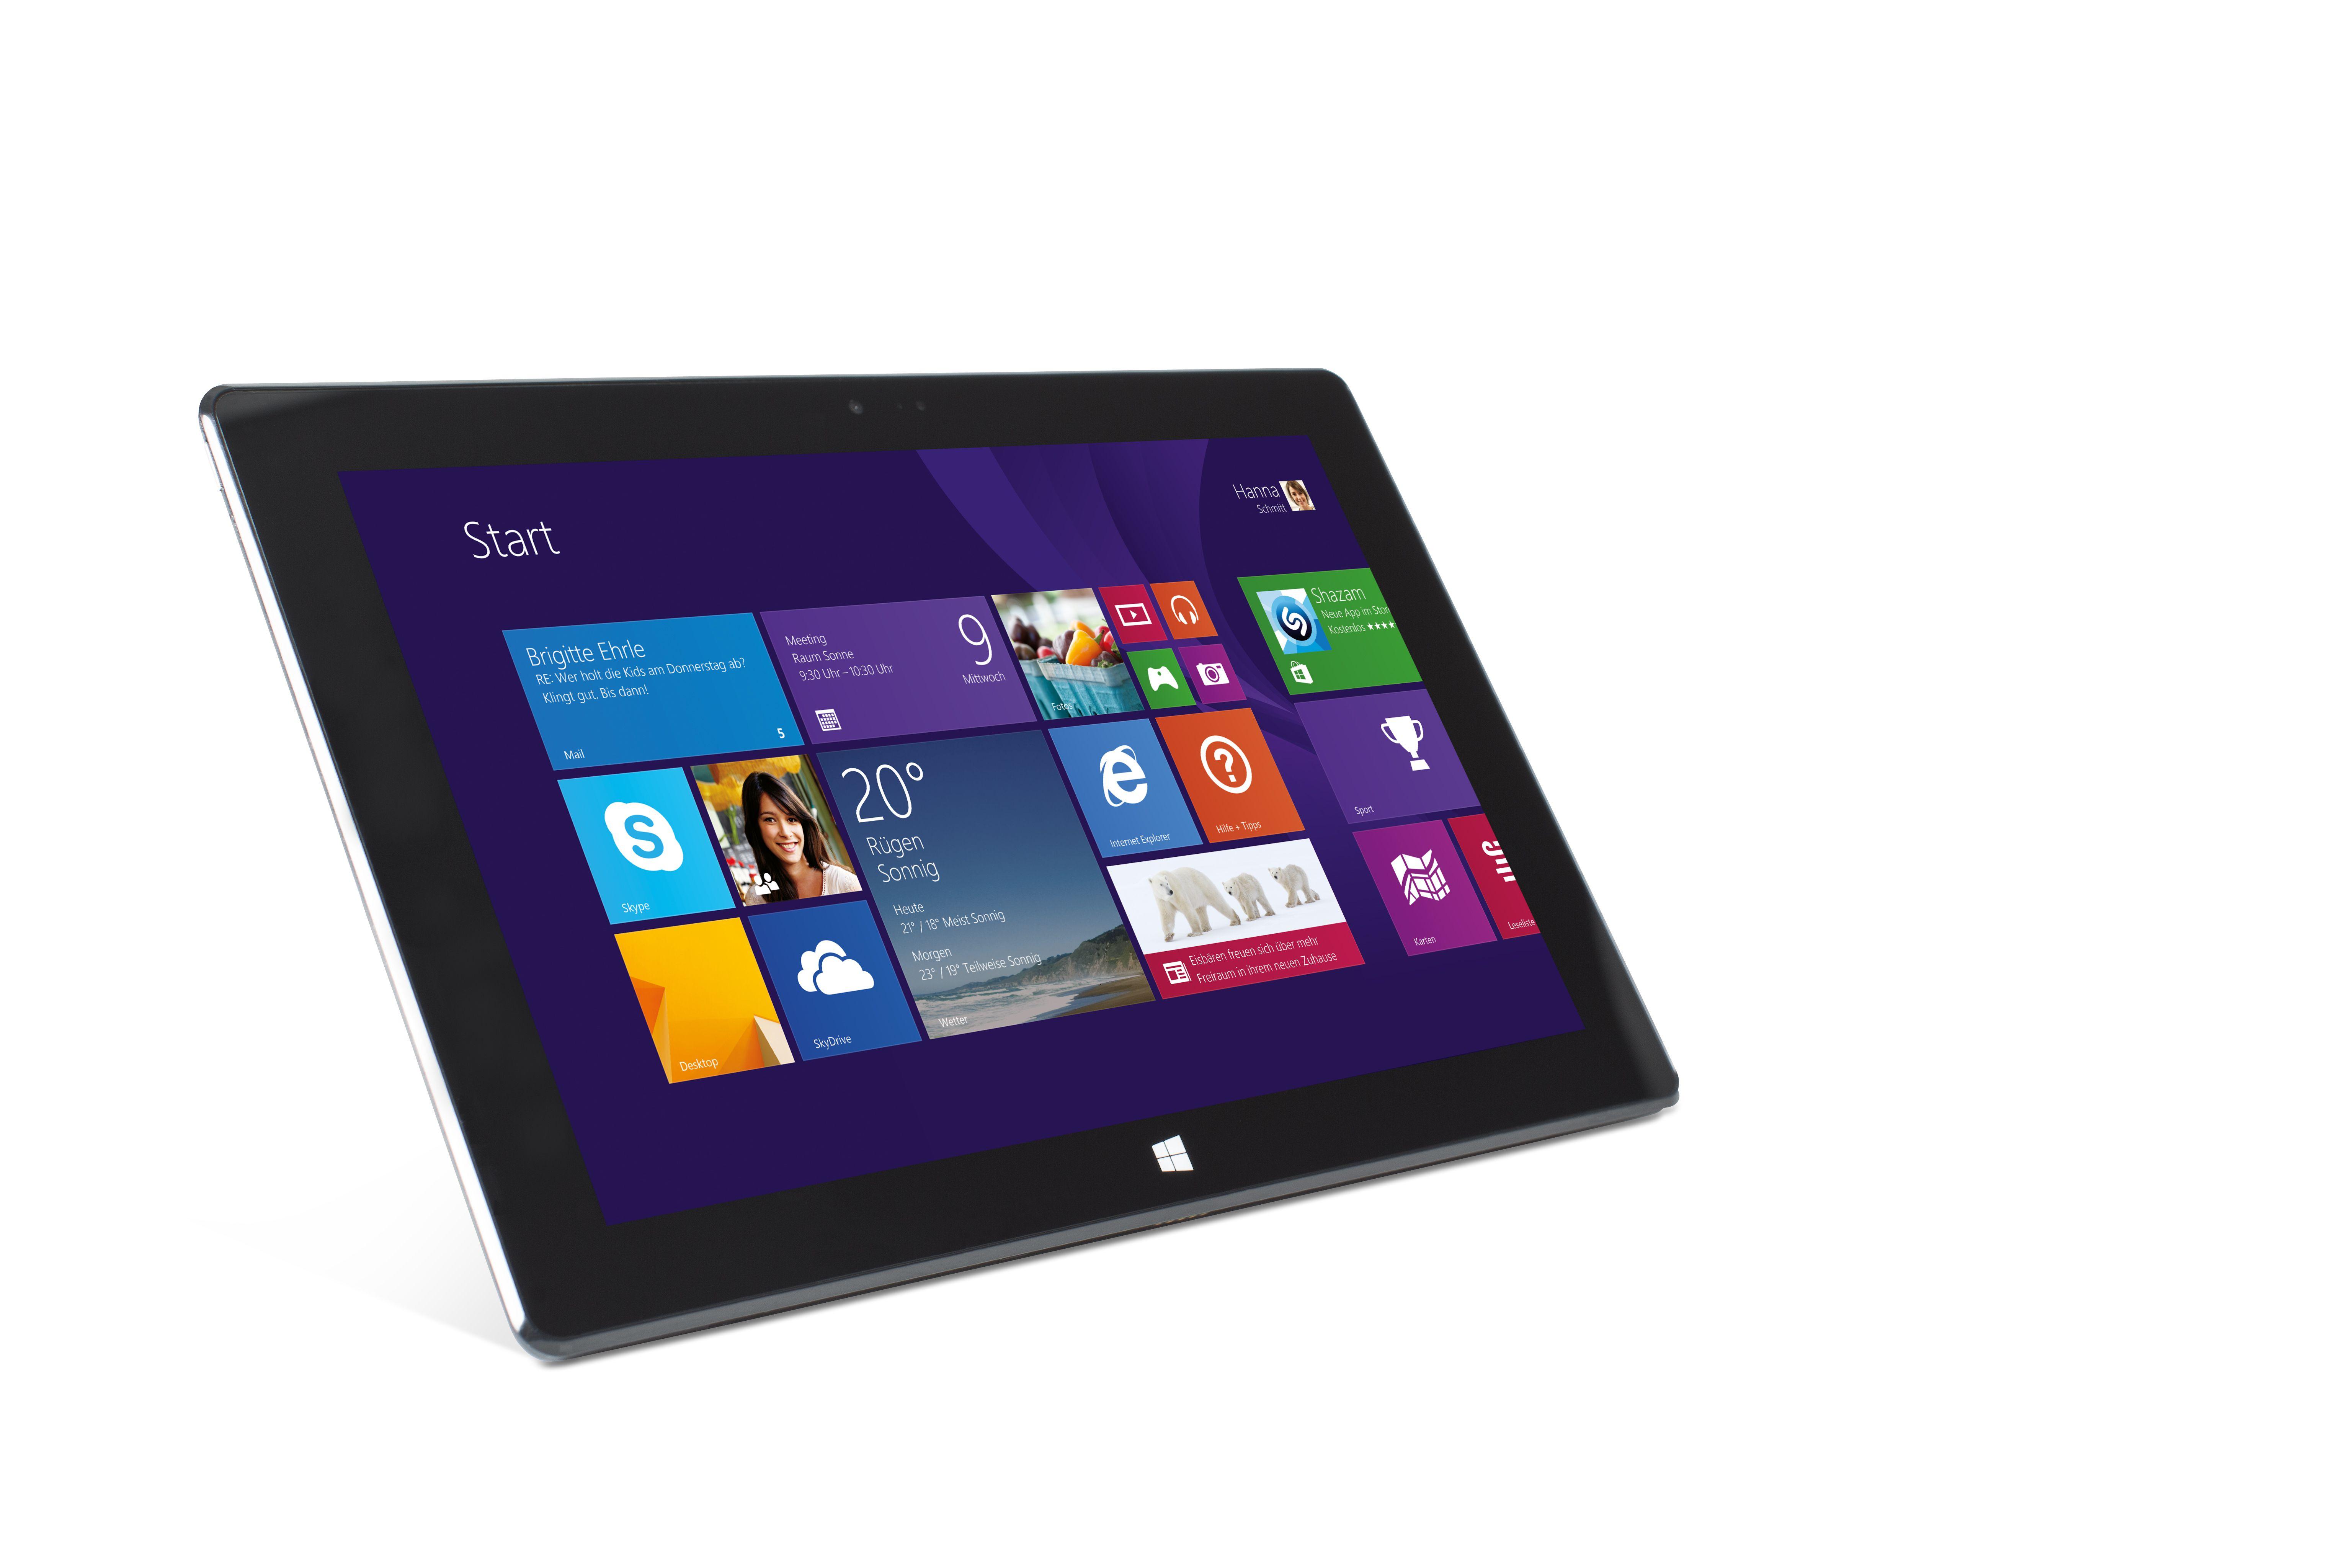 terra pad 1061 tablette windows 8 1 avec intel atom quad. Black Bedroom Furniture Sets. Home Design Ideas